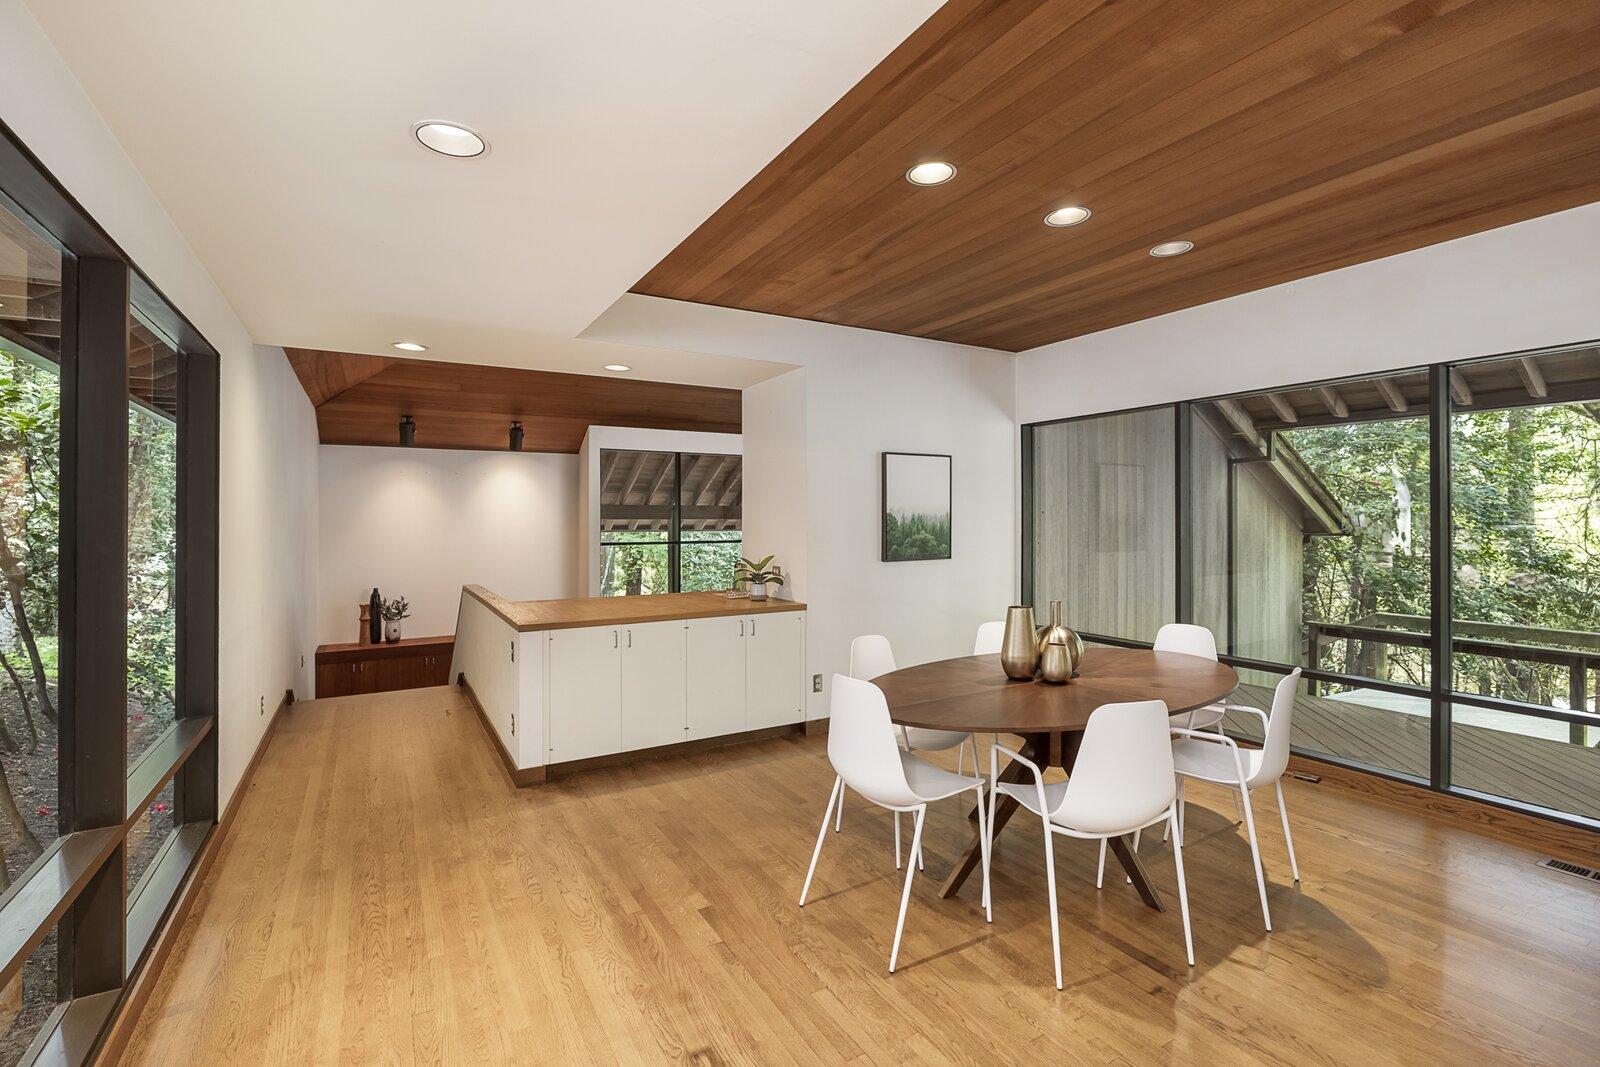 Dining room of the Mason Residence by Saul Zaik